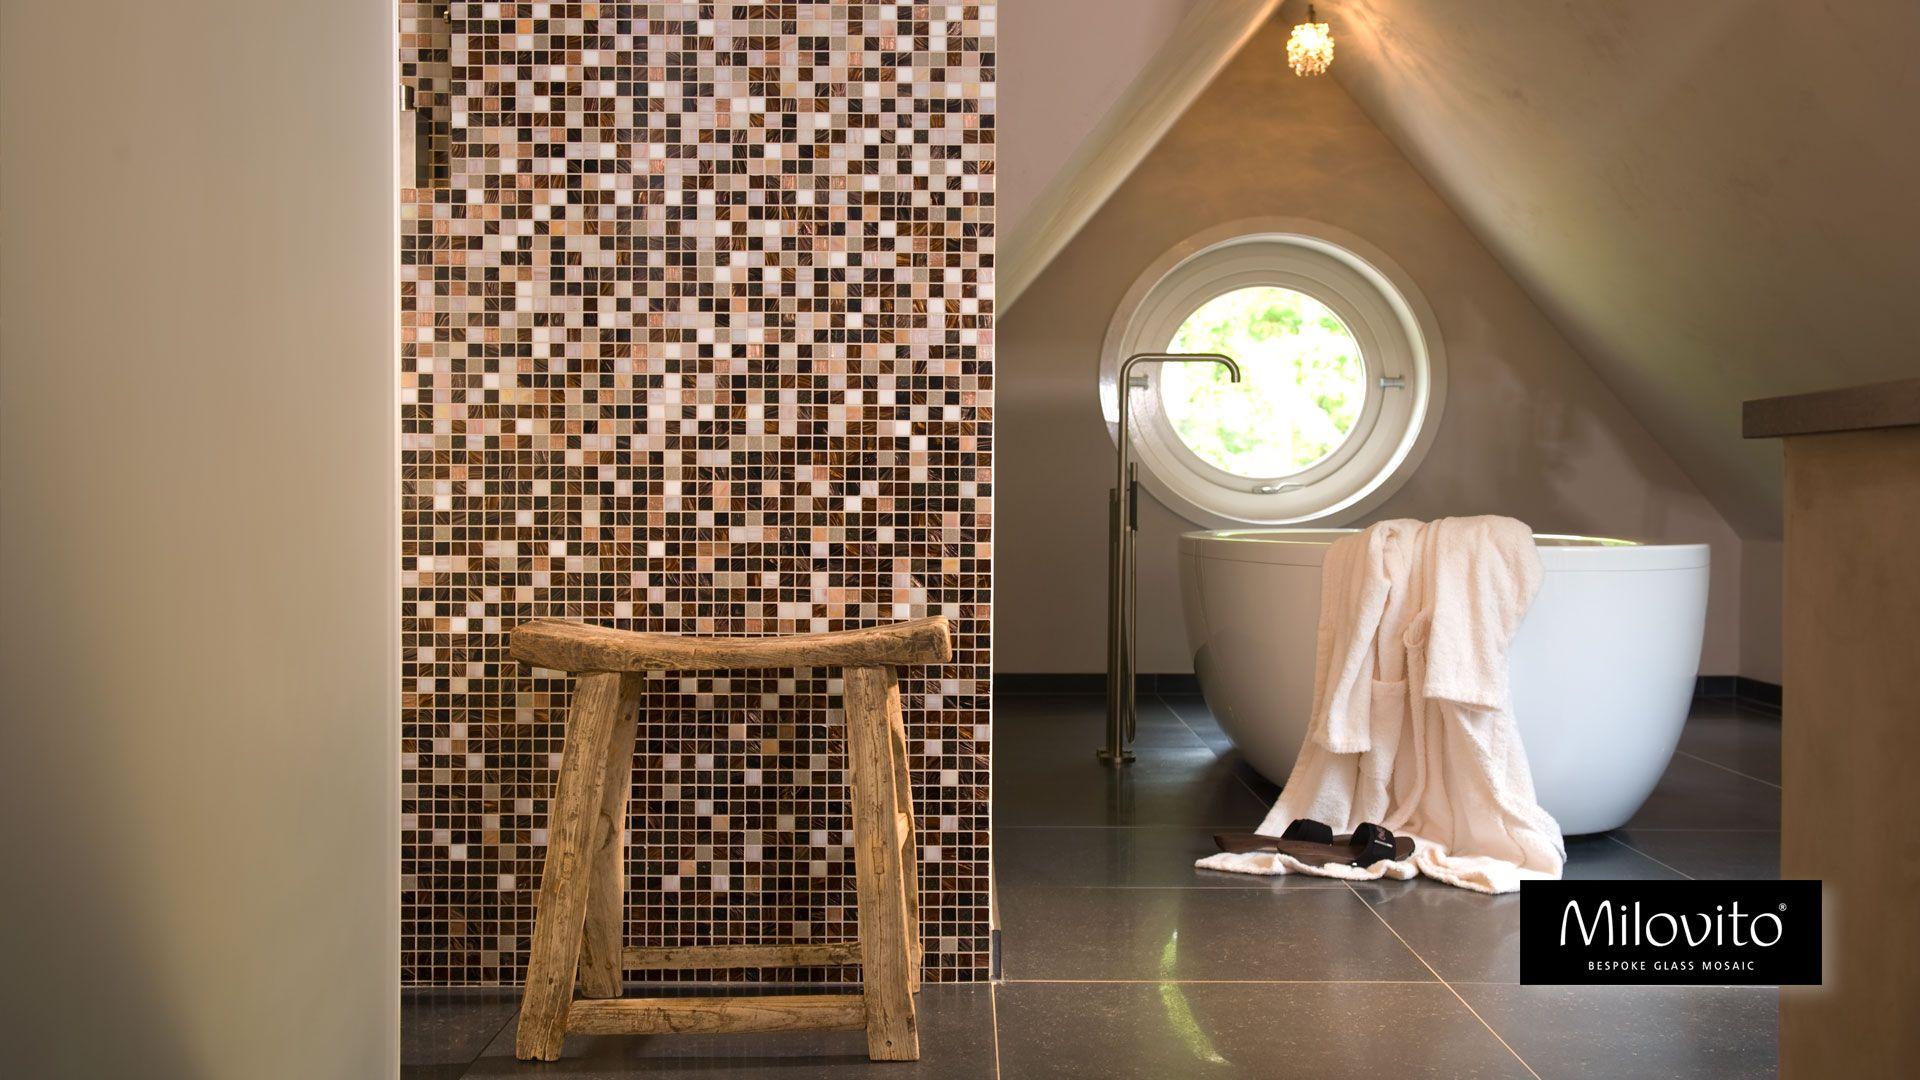 Glas Mozaiek Tegels : Mozaiek tegels badkamer bruin beige glasmozaiek mozaïek